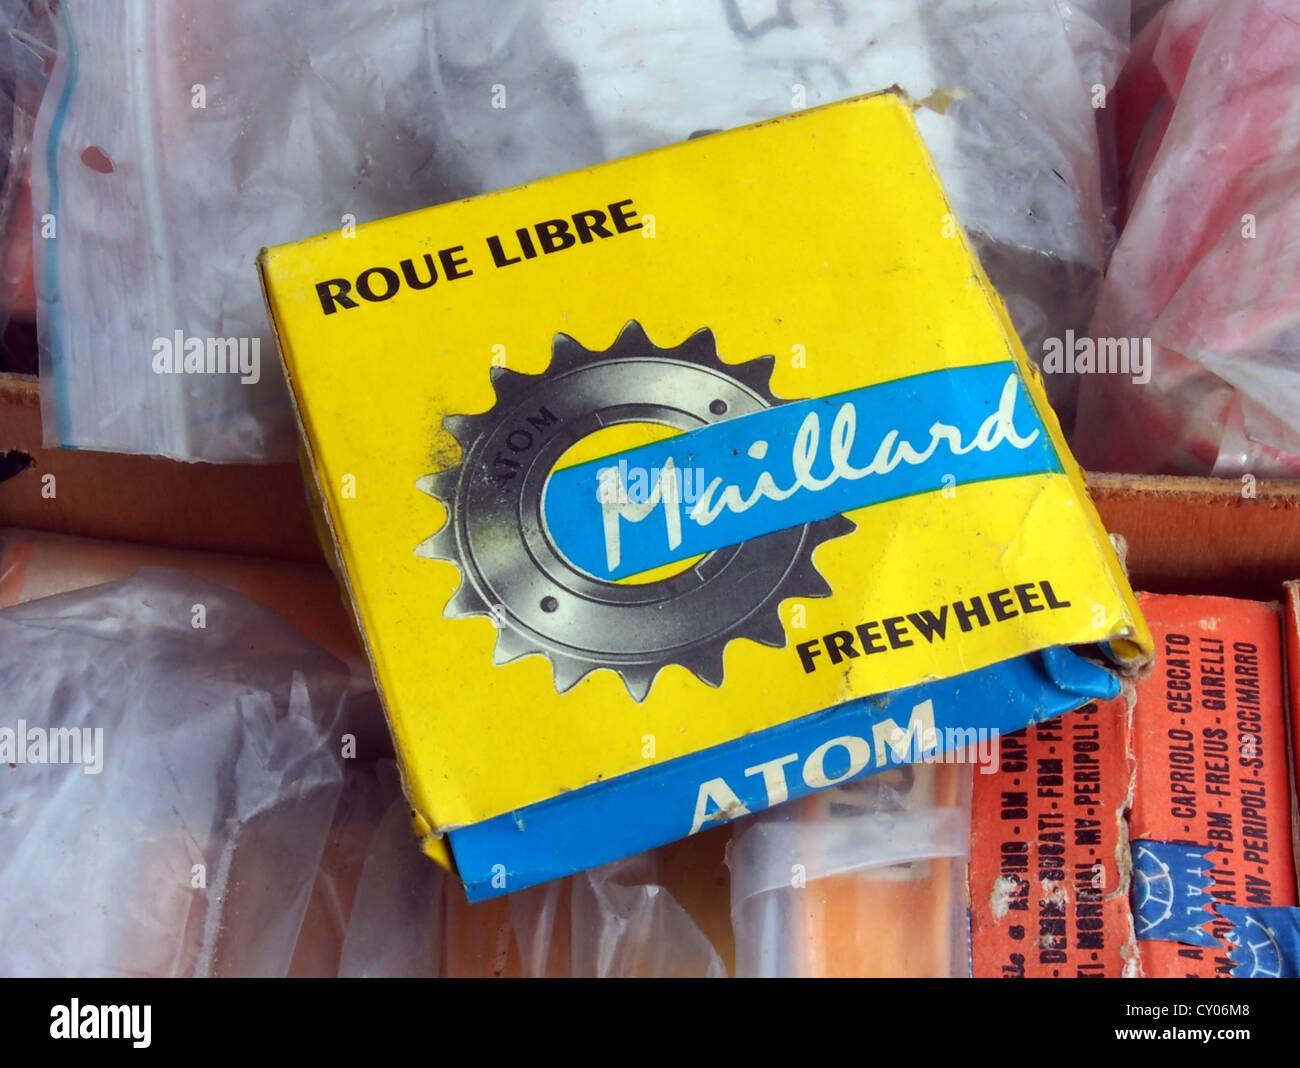 Maillard Atom Freewheel Roue Libre - Stock Image